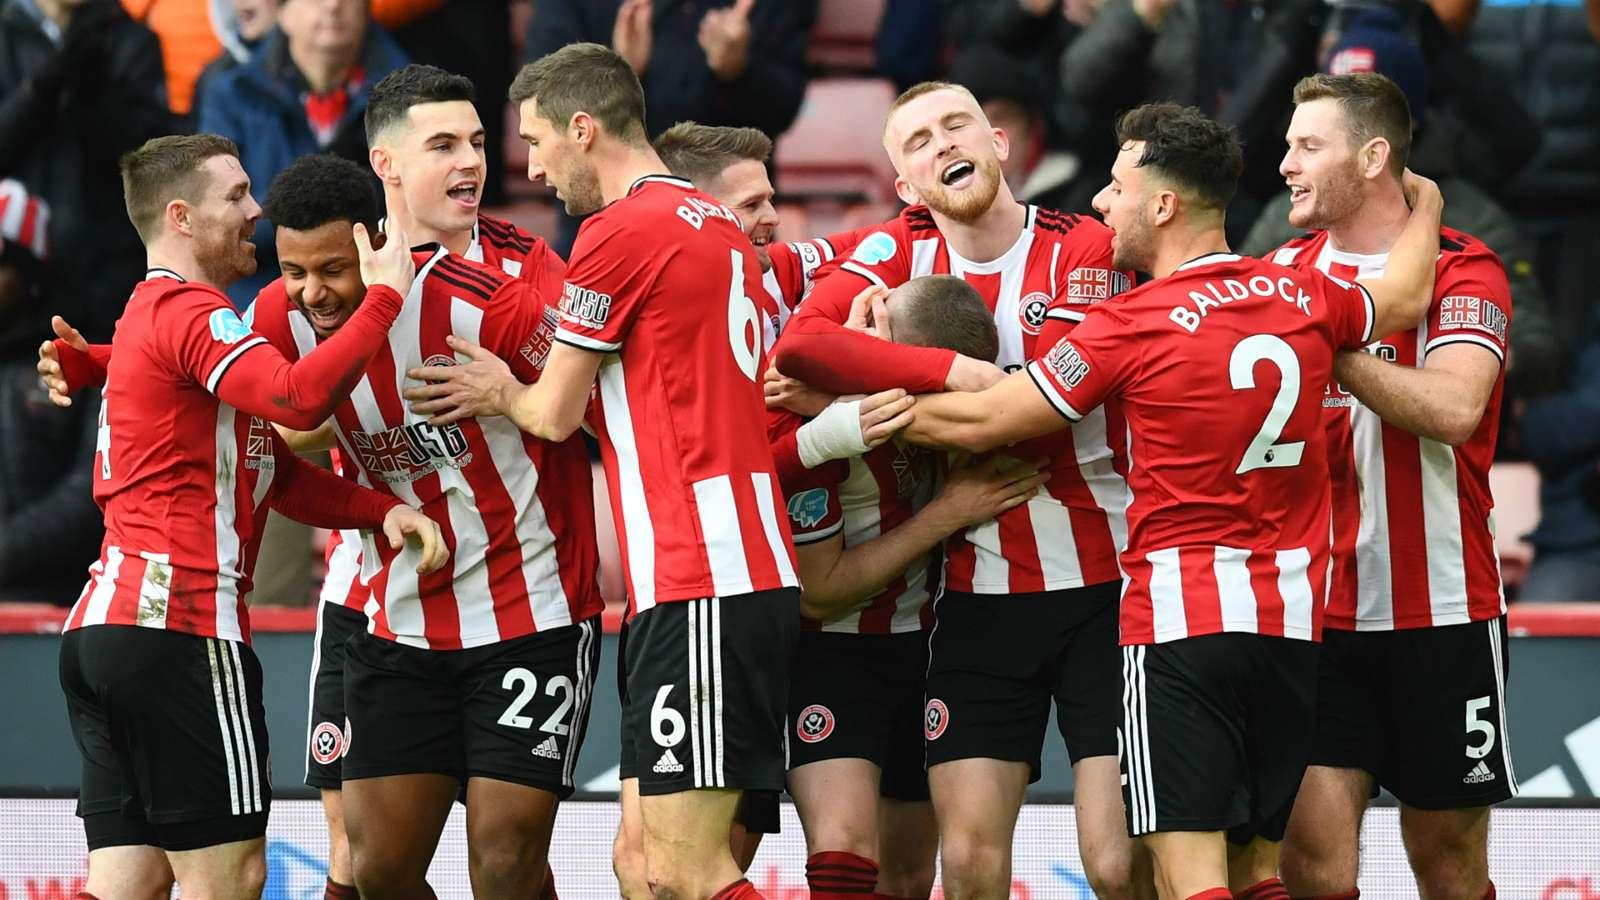 Sheffield United celebrate 2019-20